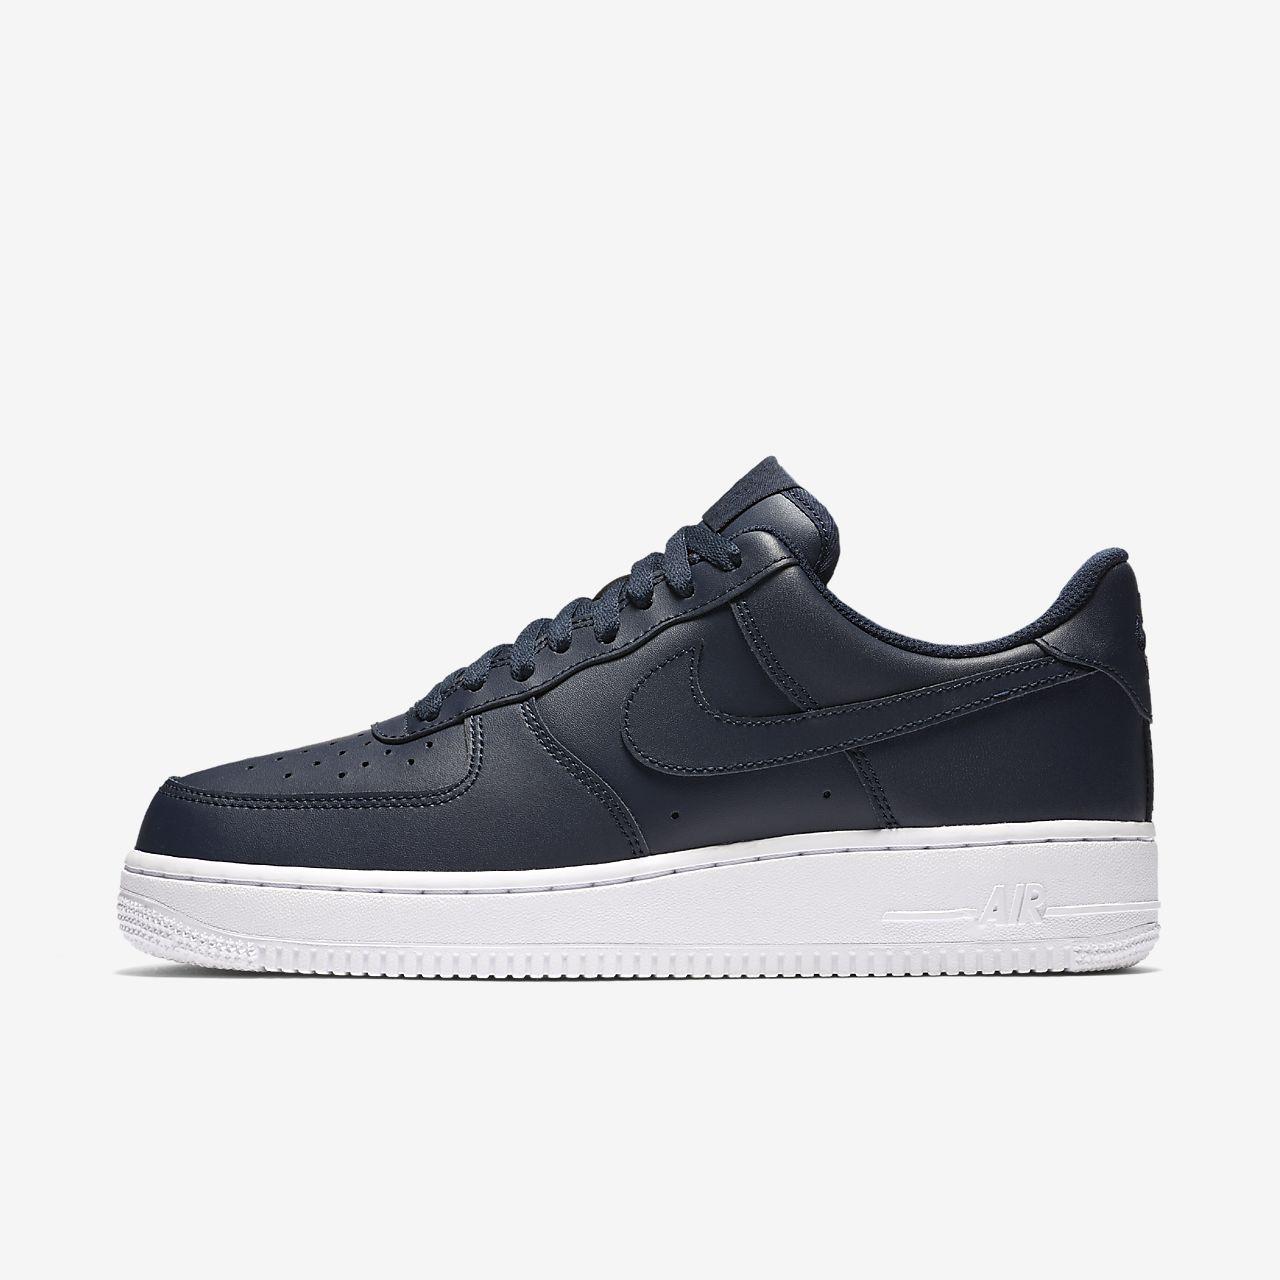 check out 3bdf4 78f19 ... Sko Nike Air Force 1 07 för män